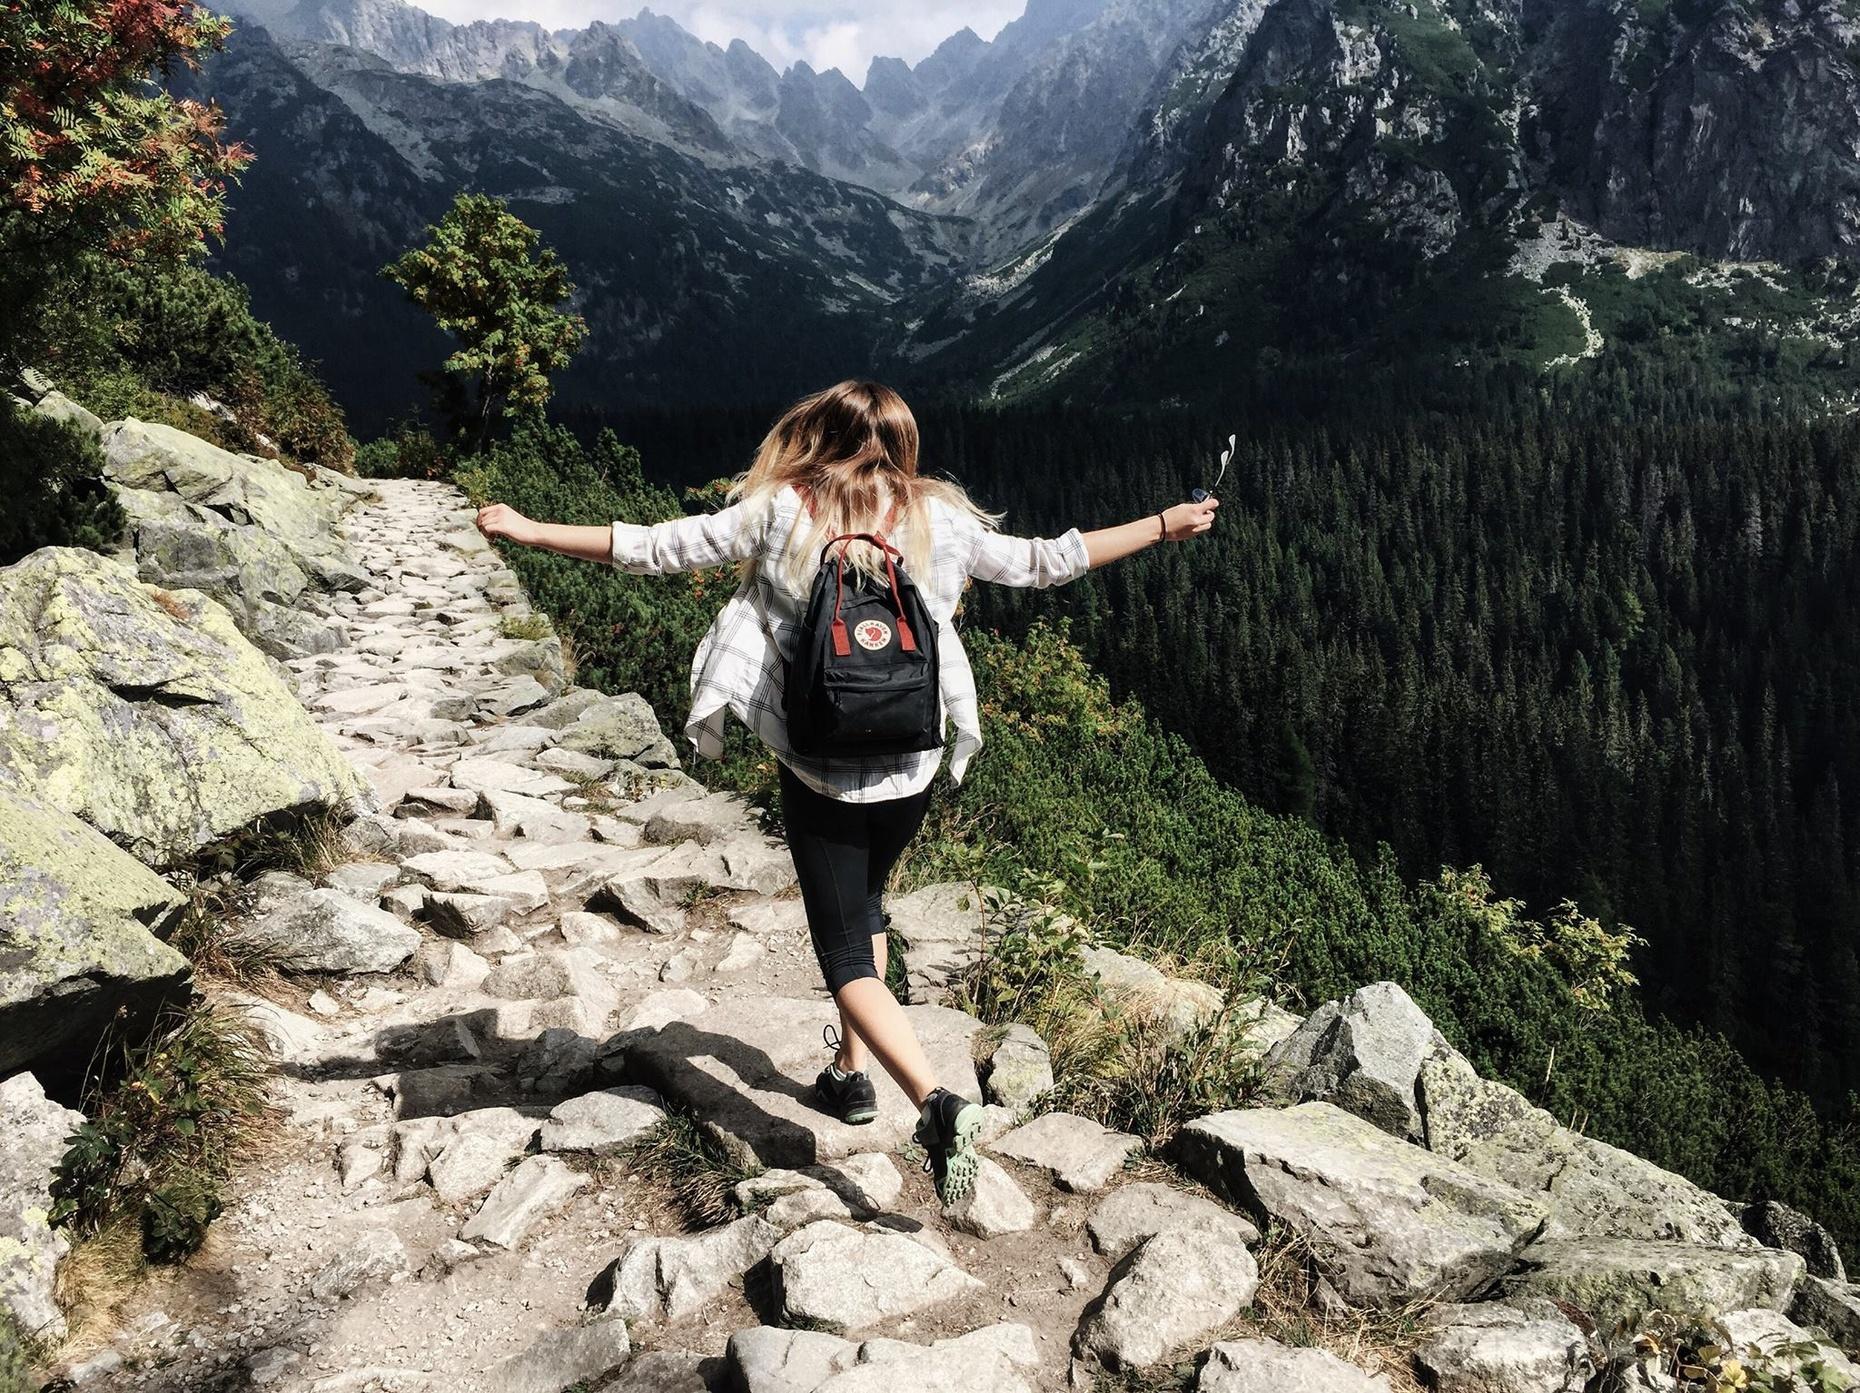 Full-Day Yosemite Tour